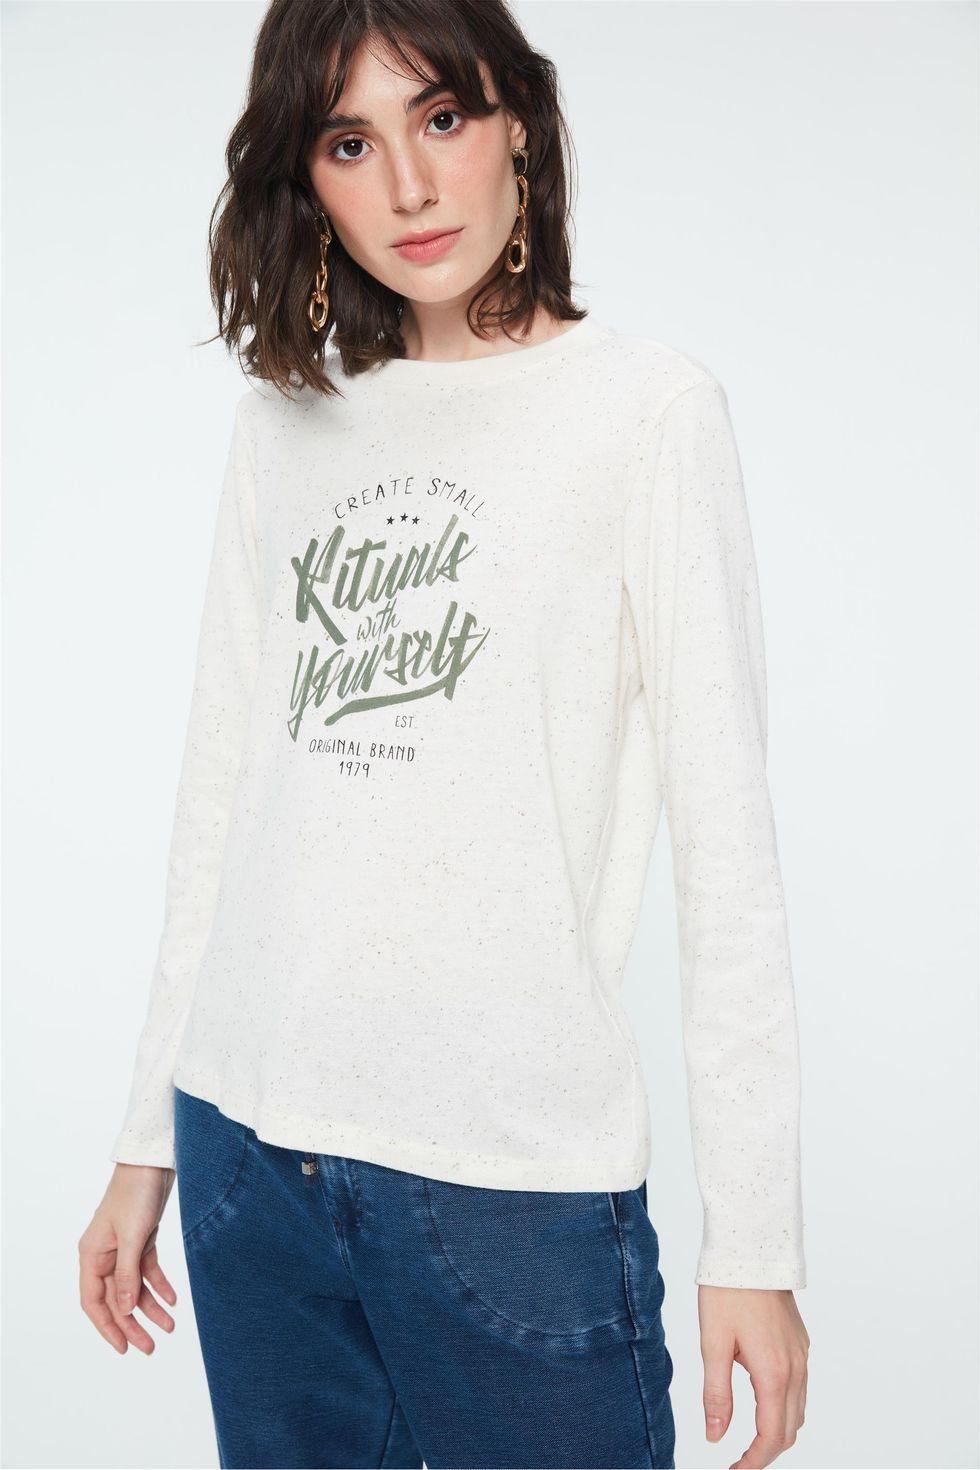 Camiseta-Estampa-Rituals-With-Yourself-Frente--